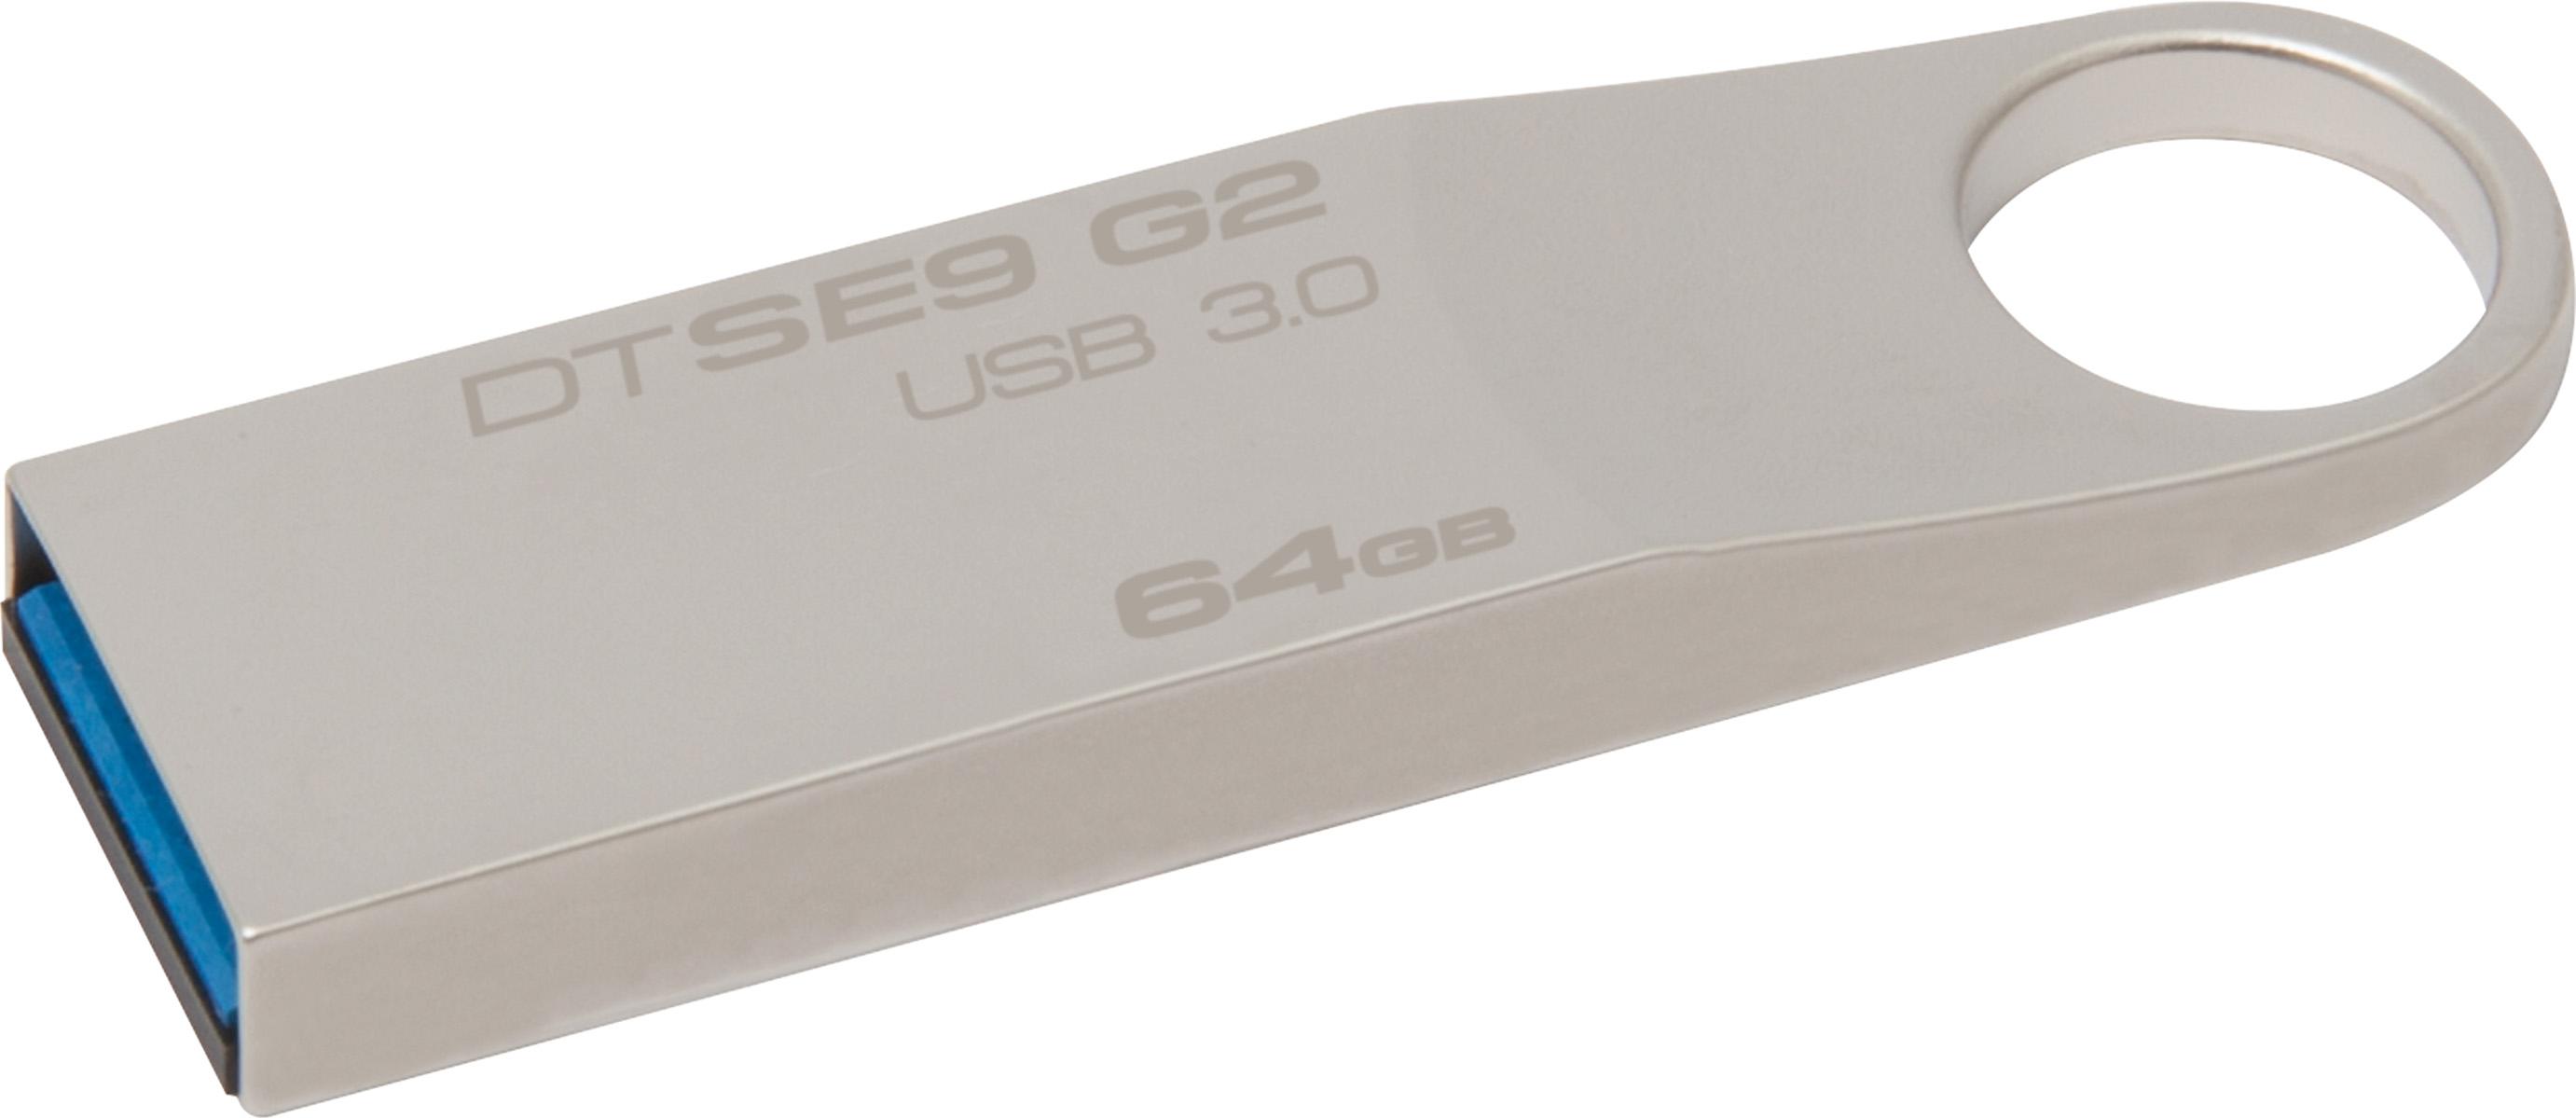 Kingston DataTraveler SE9 G2 USB 3.0 (64GB)